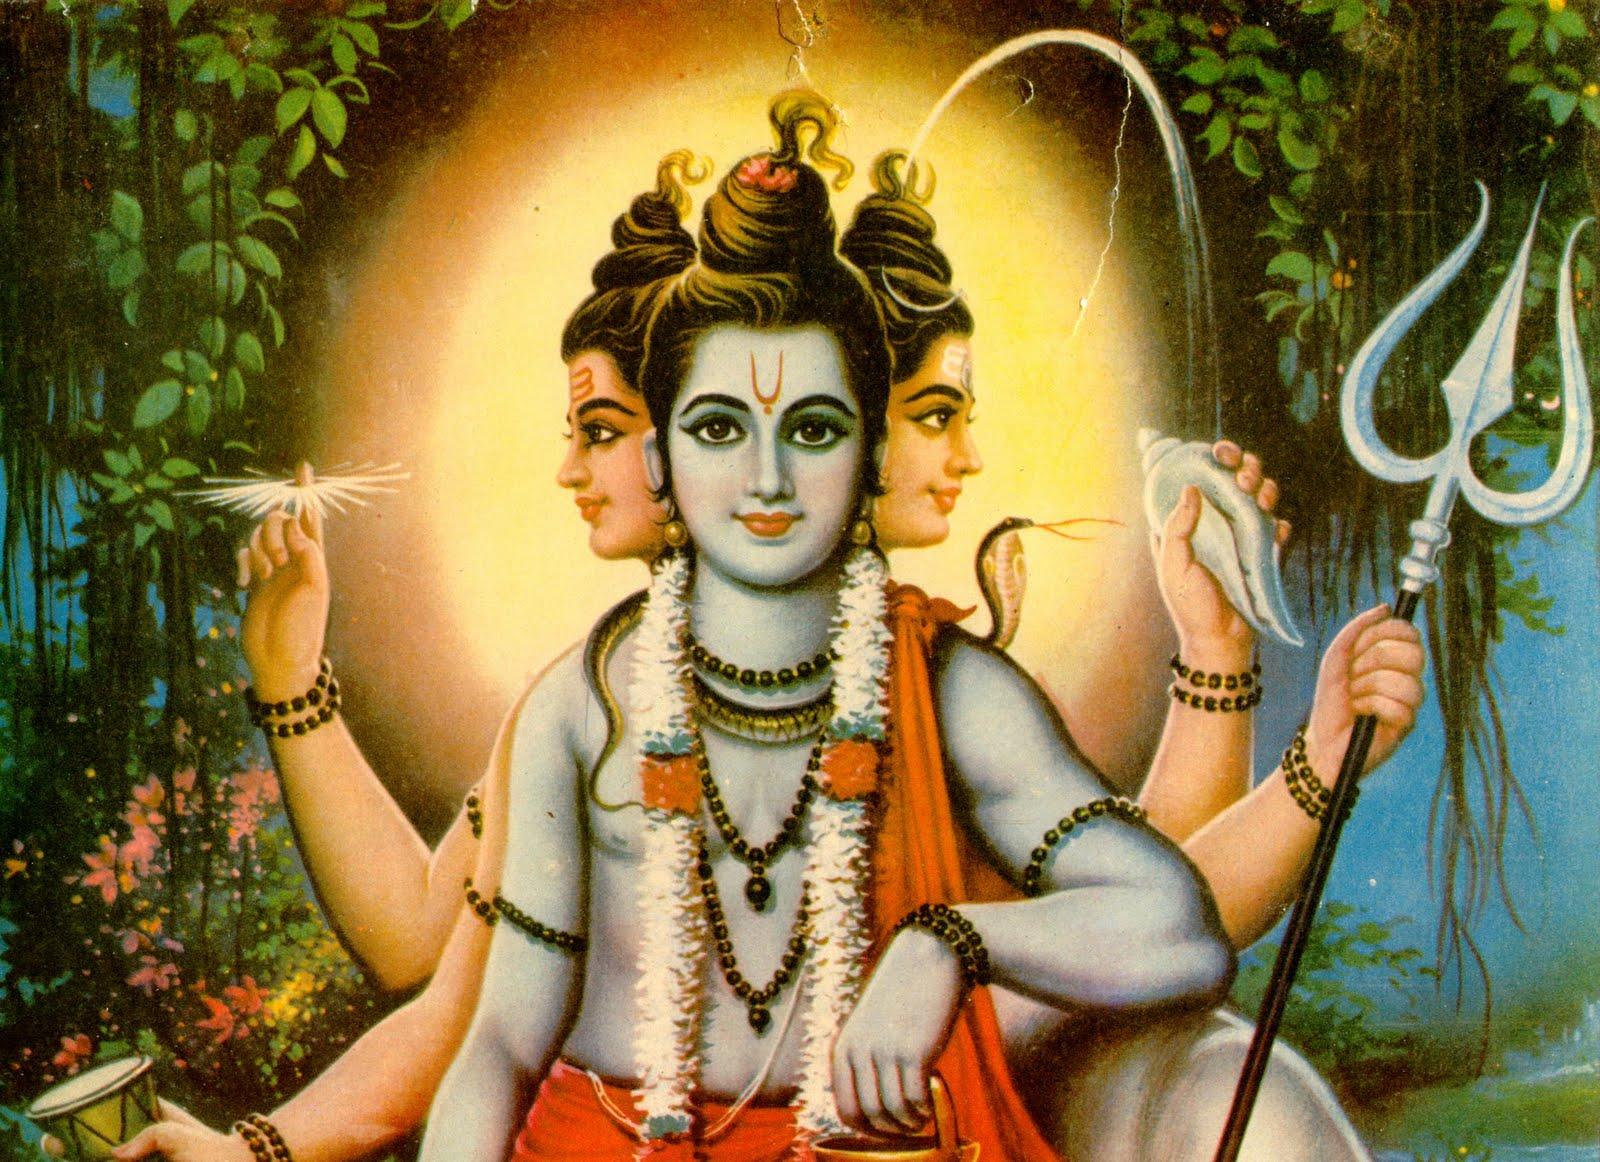 Good Wallpaper Lord Hindu - DattatrePicture  Image_80331.JPG